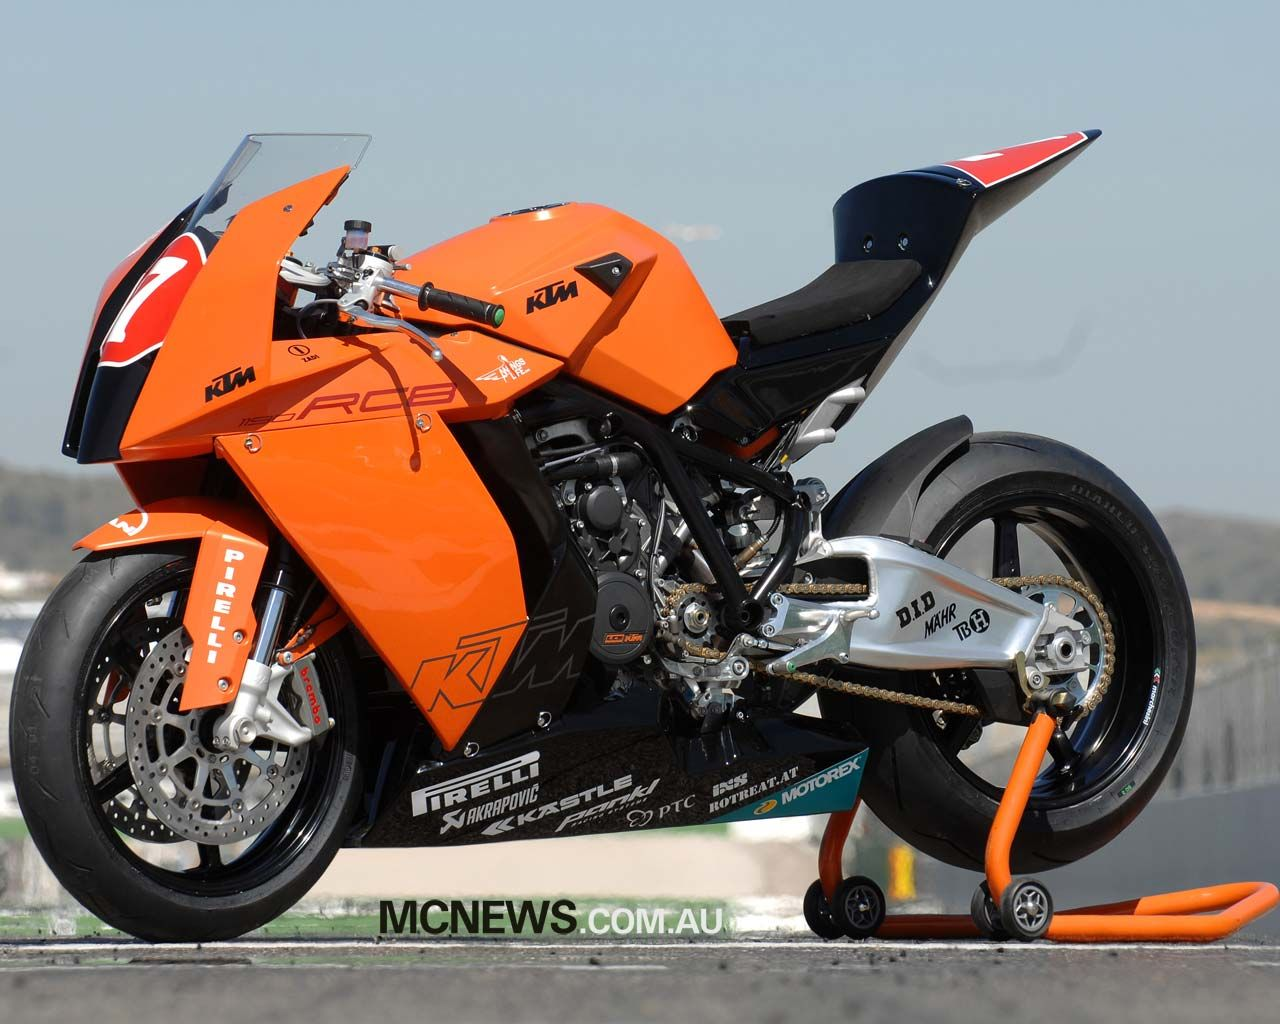 KTM 1190 RC8 easily the sexiest performance street bike